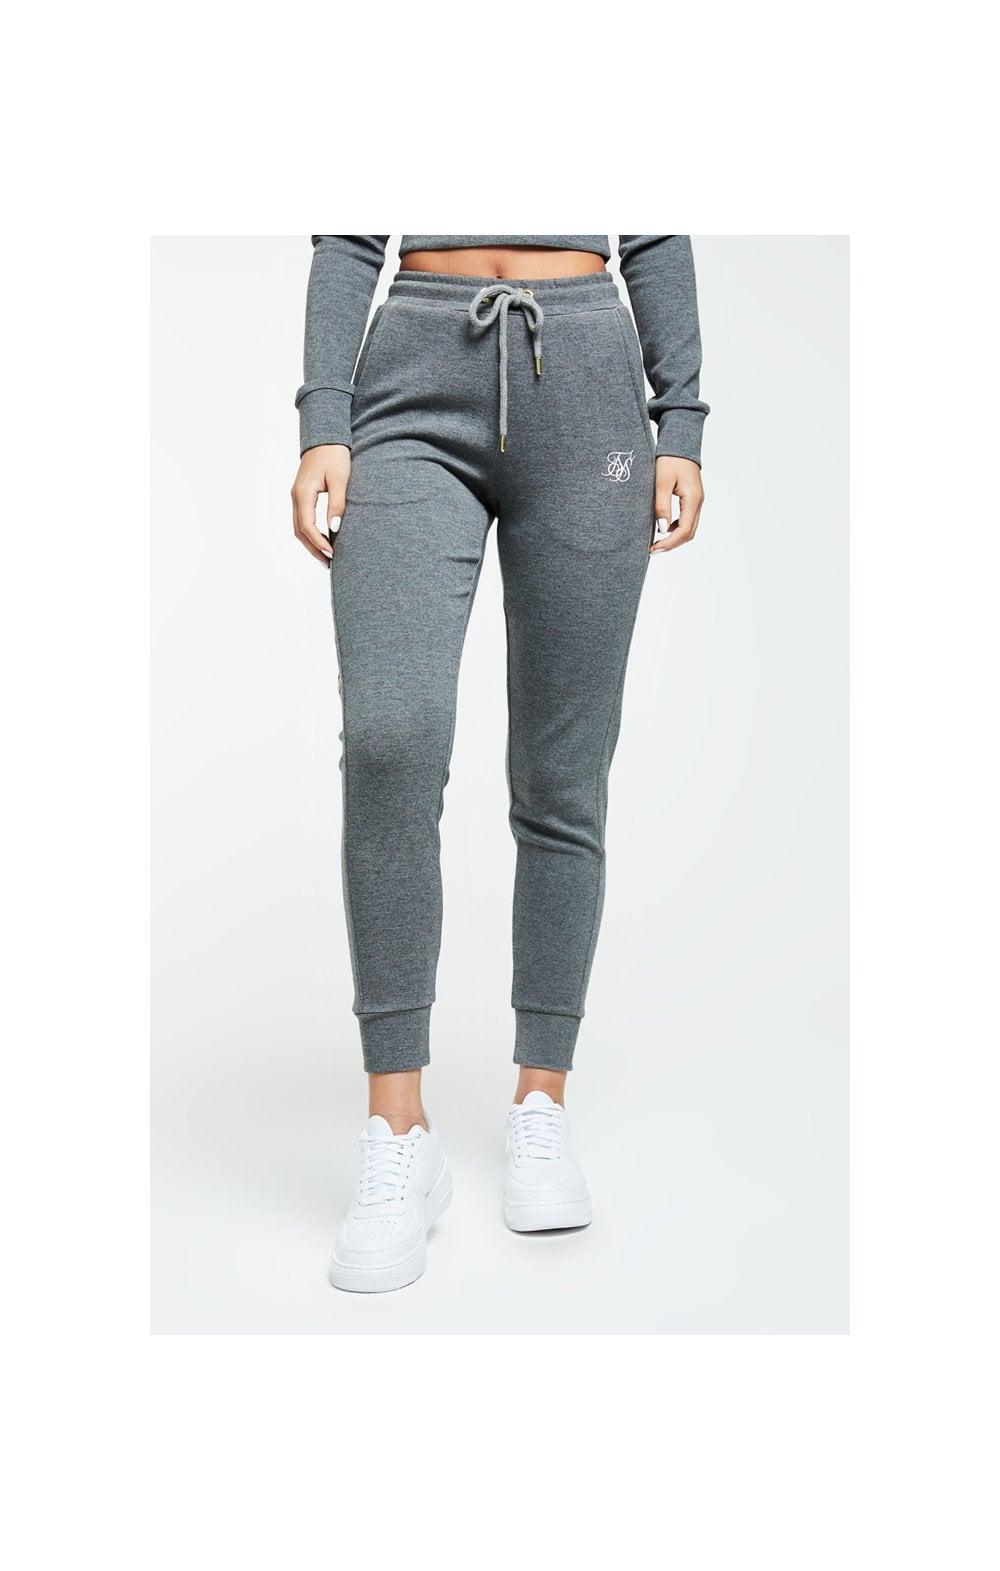 SikSilk Colour Signature Track Pants - Dark Grey Marl WOMEN SIZES: 6-XXS